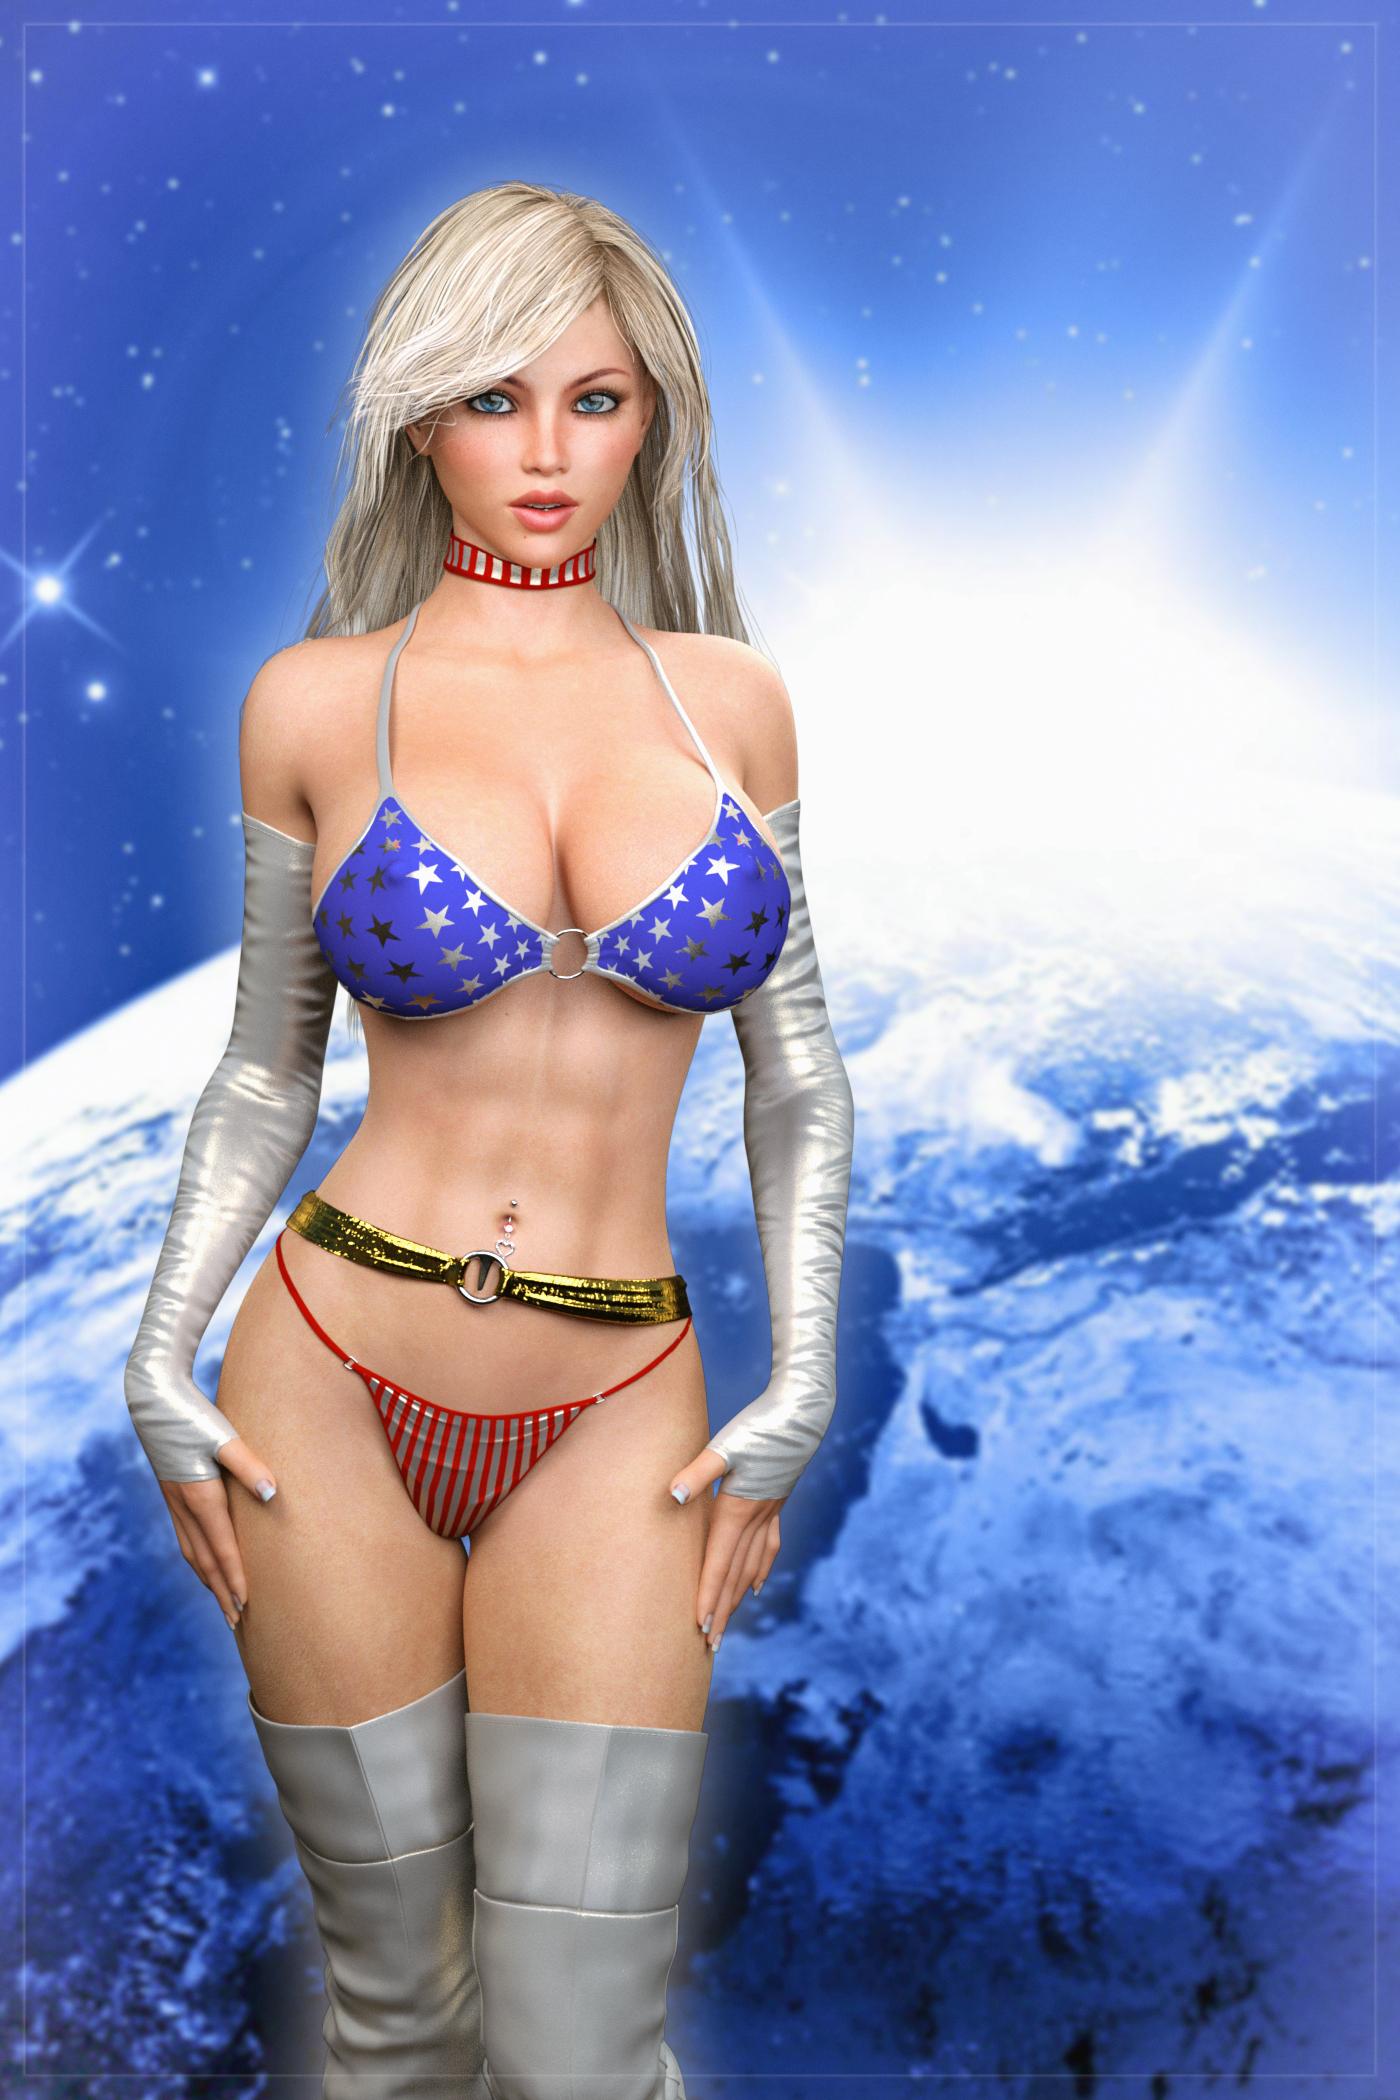 Star spangled girl, intro ... (IRay) by darkhound1